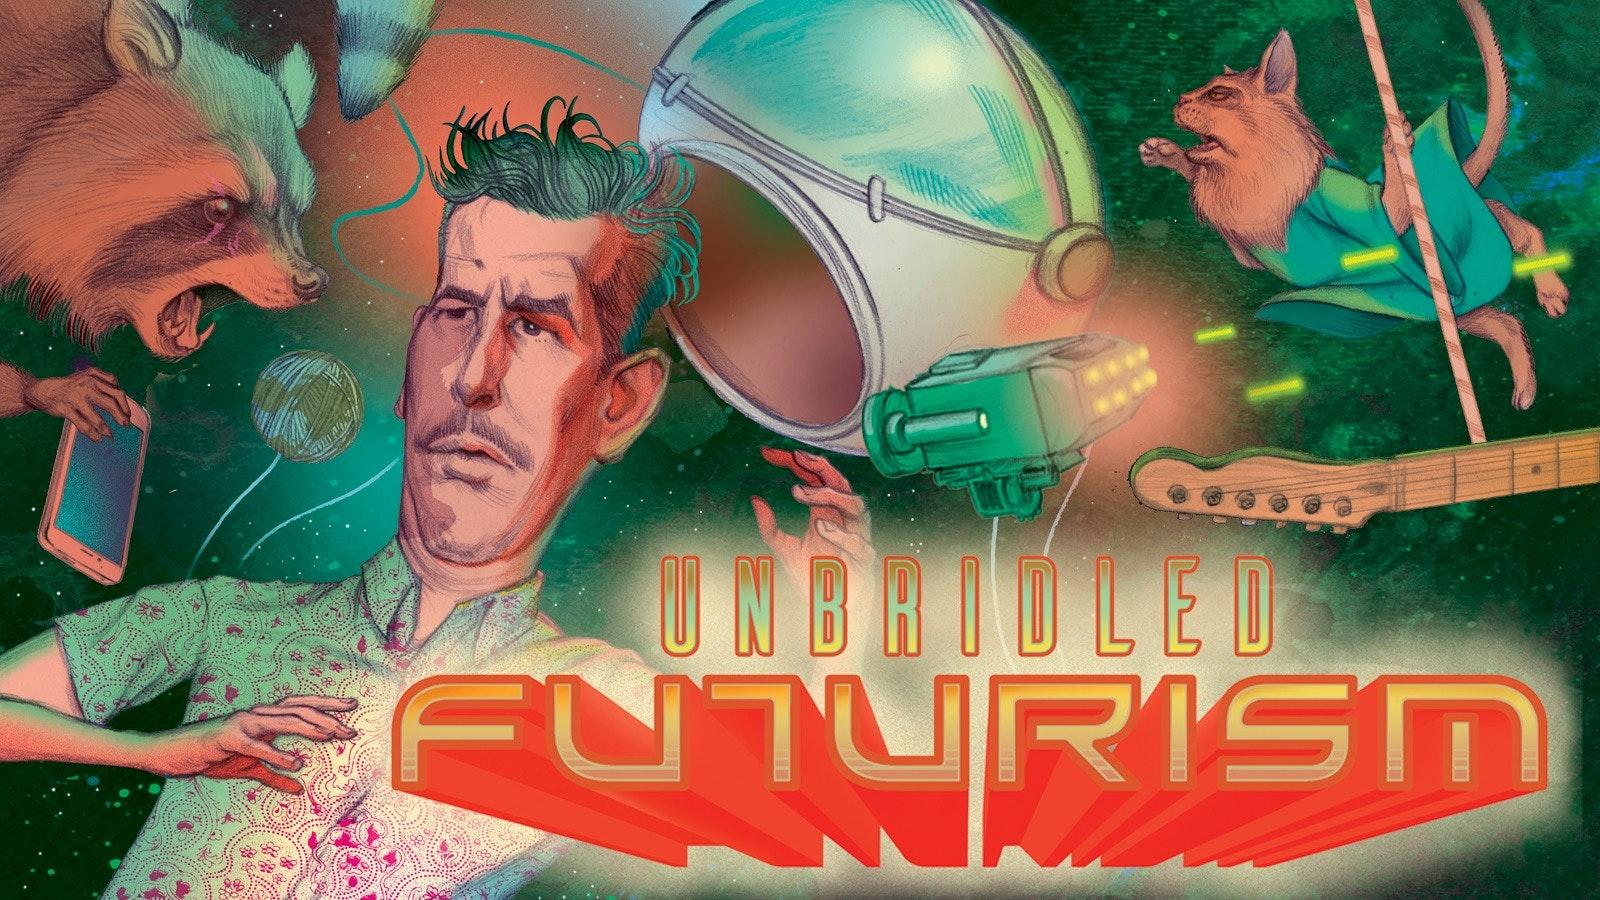 Unbridled Futurism